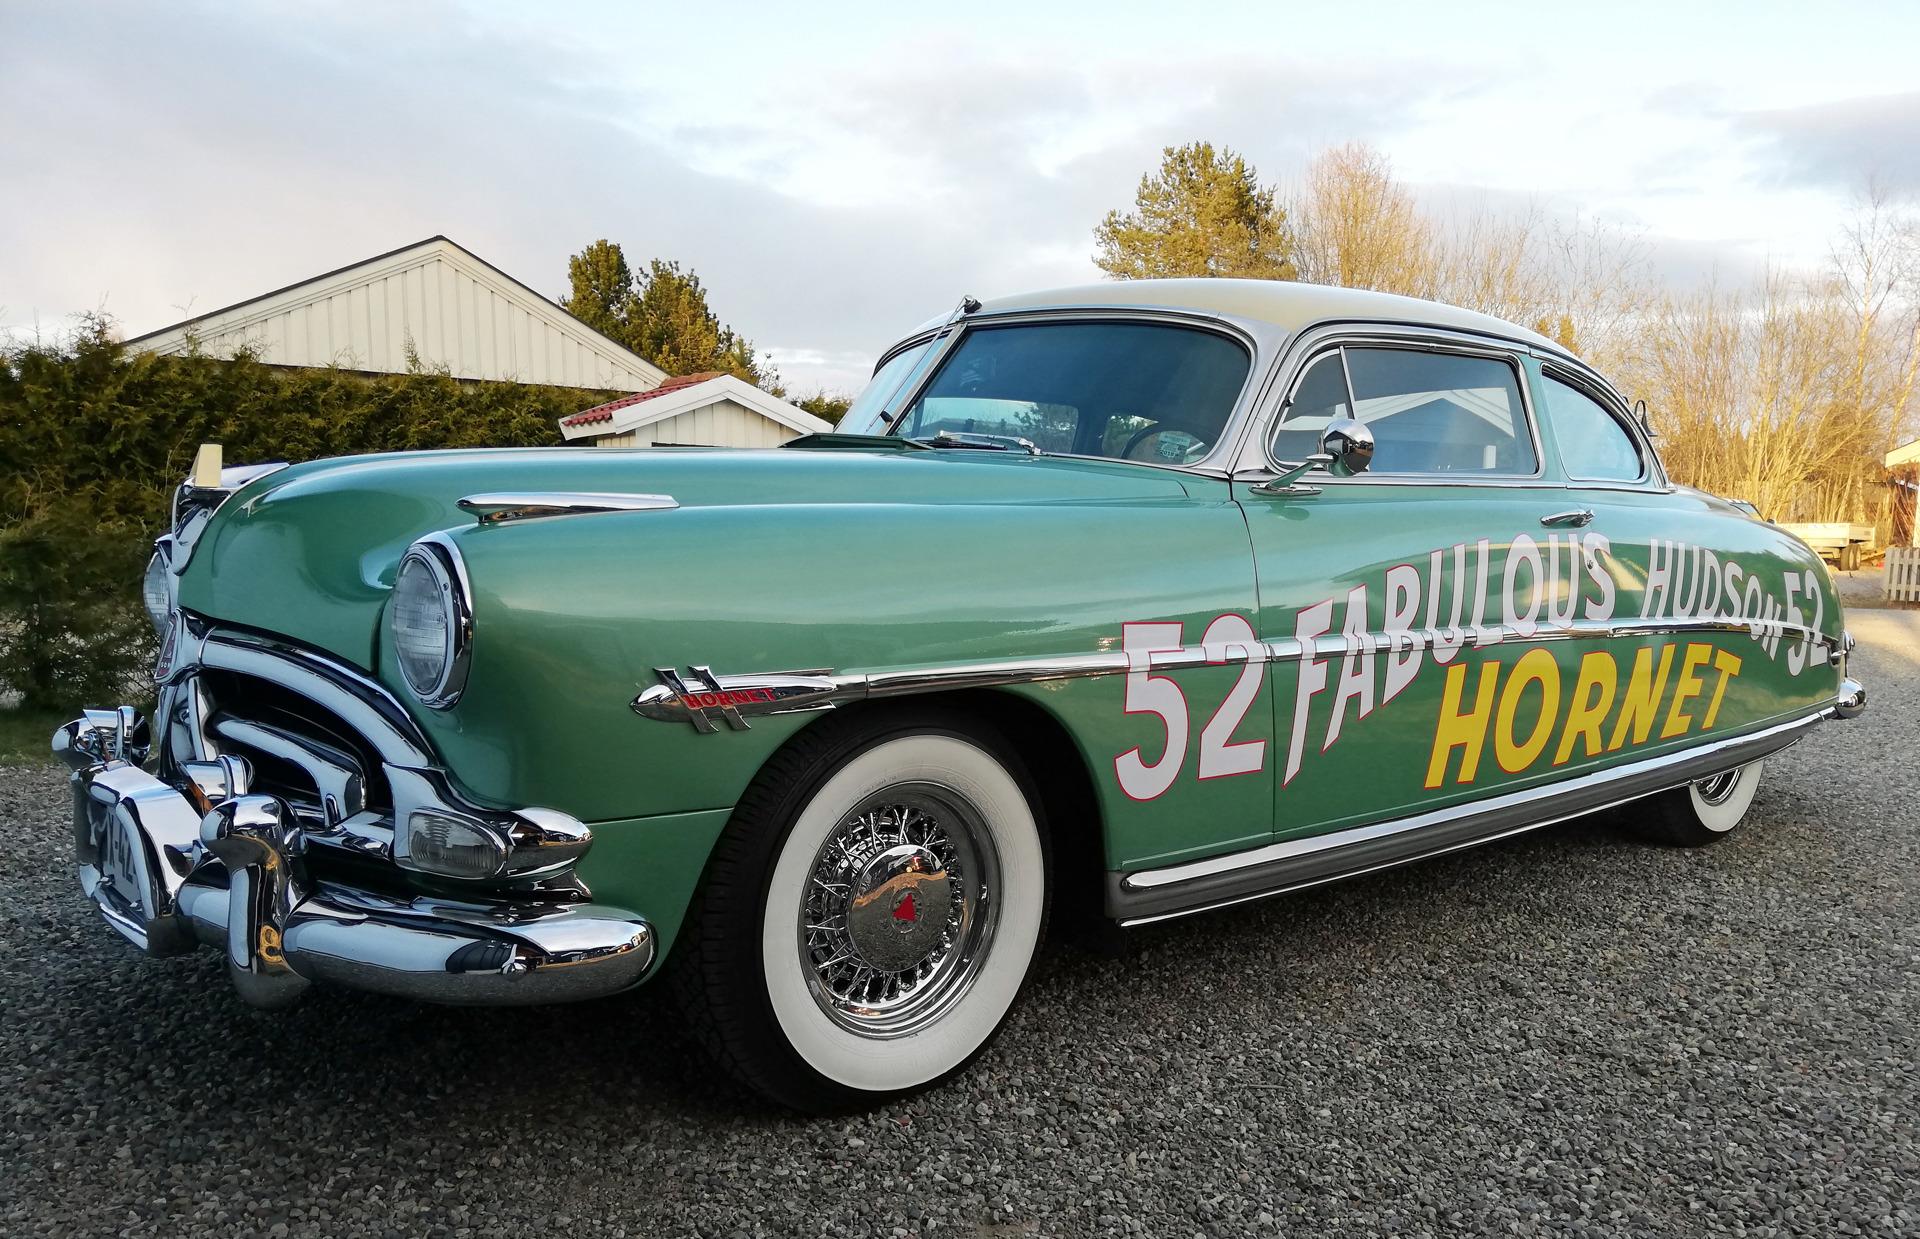 157-1952 Hudson Hornet Club Coupe 01. Eiere- medle